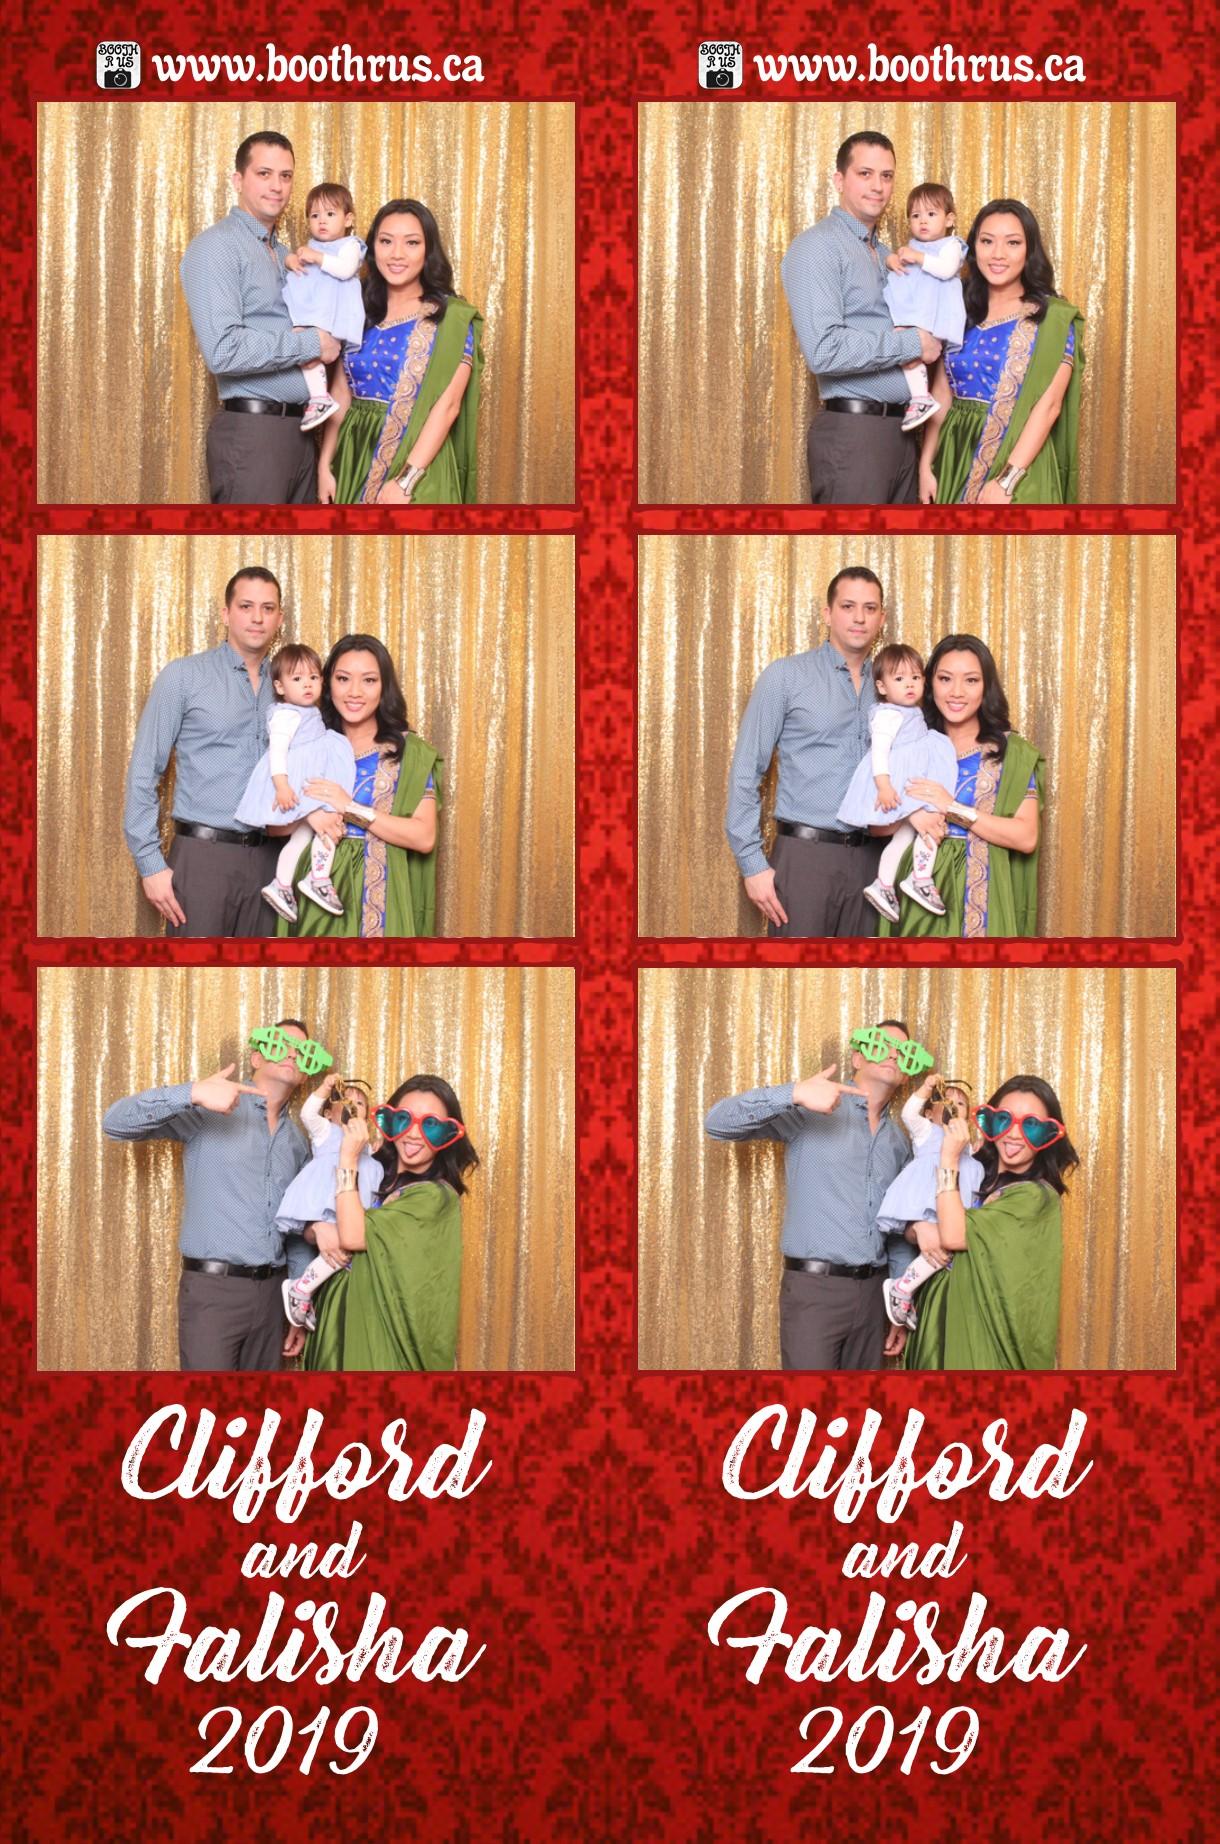 Clifford and Falisha Wedding Day